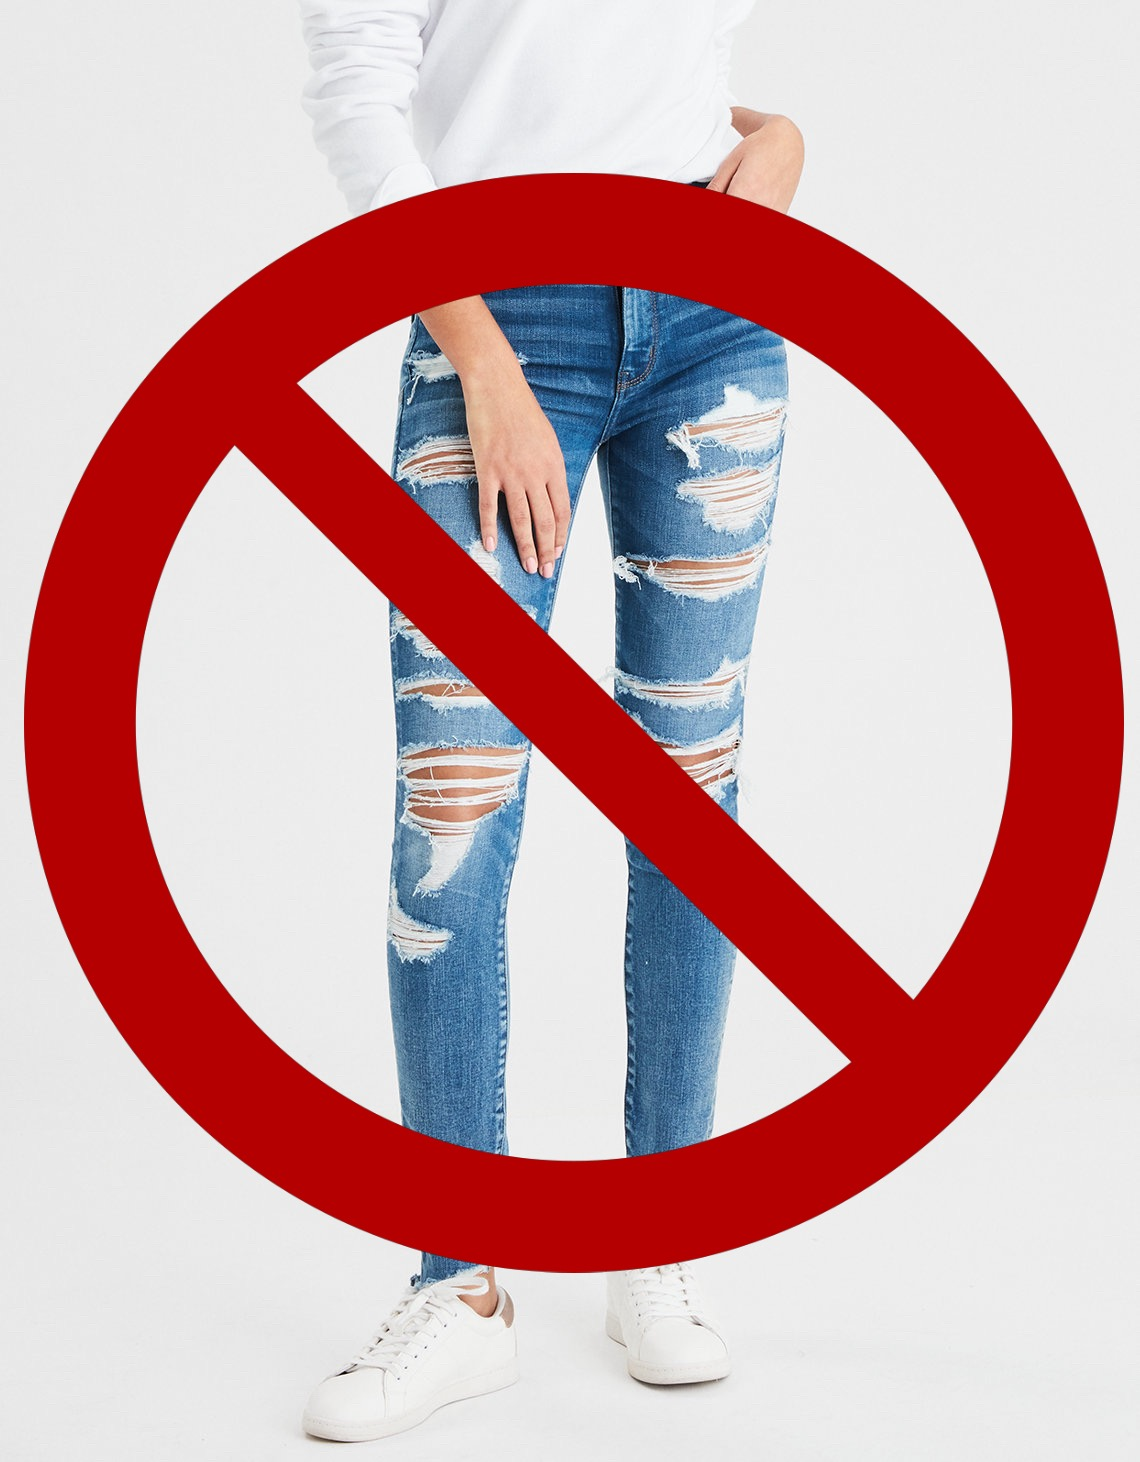 The Dreaded Dress Code Ban